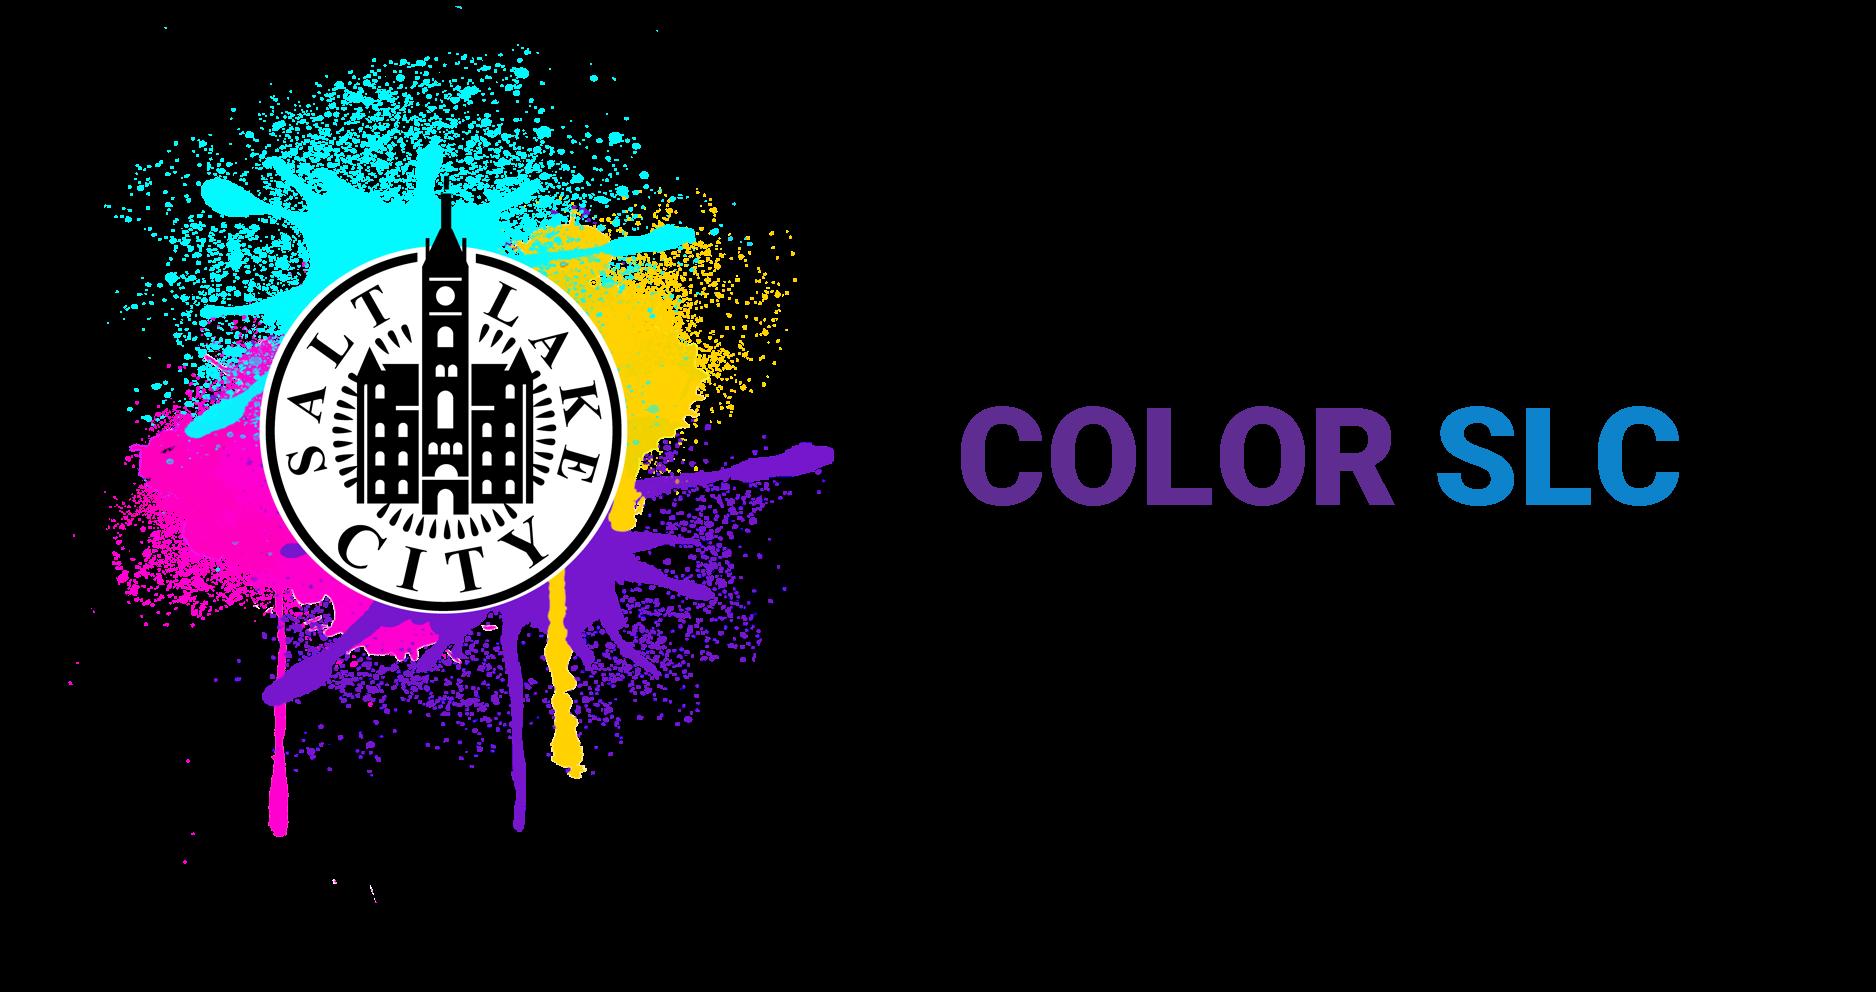 Color SLC Graphic